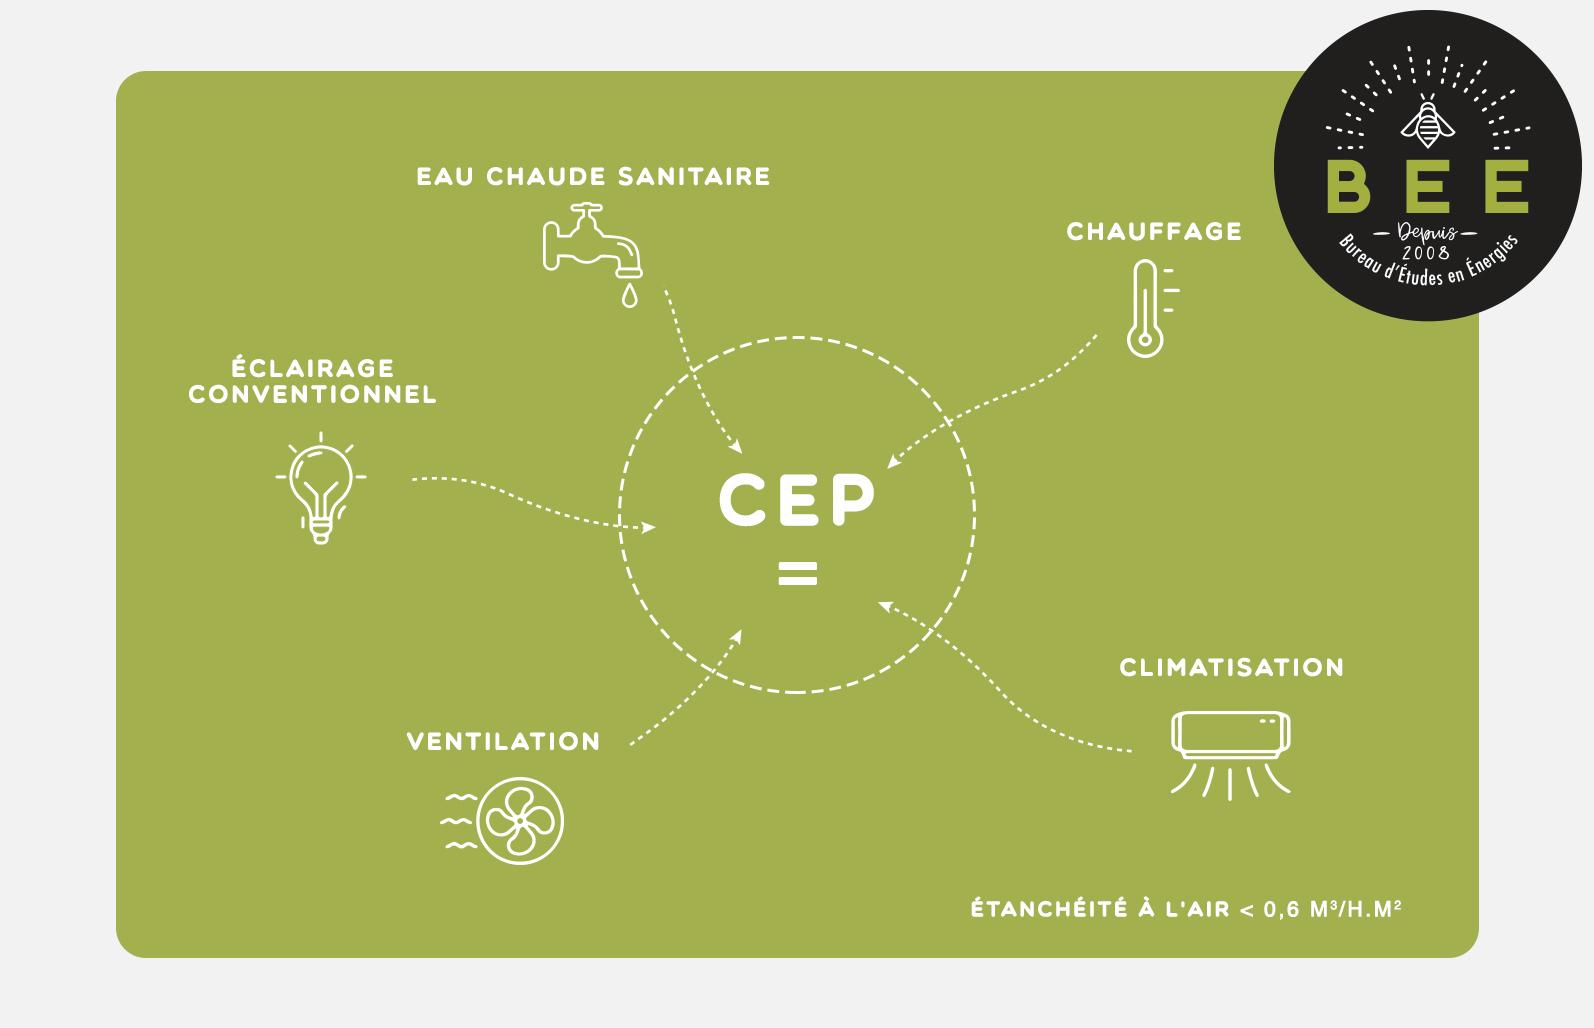 cep-etude-bbc-thermique-bee